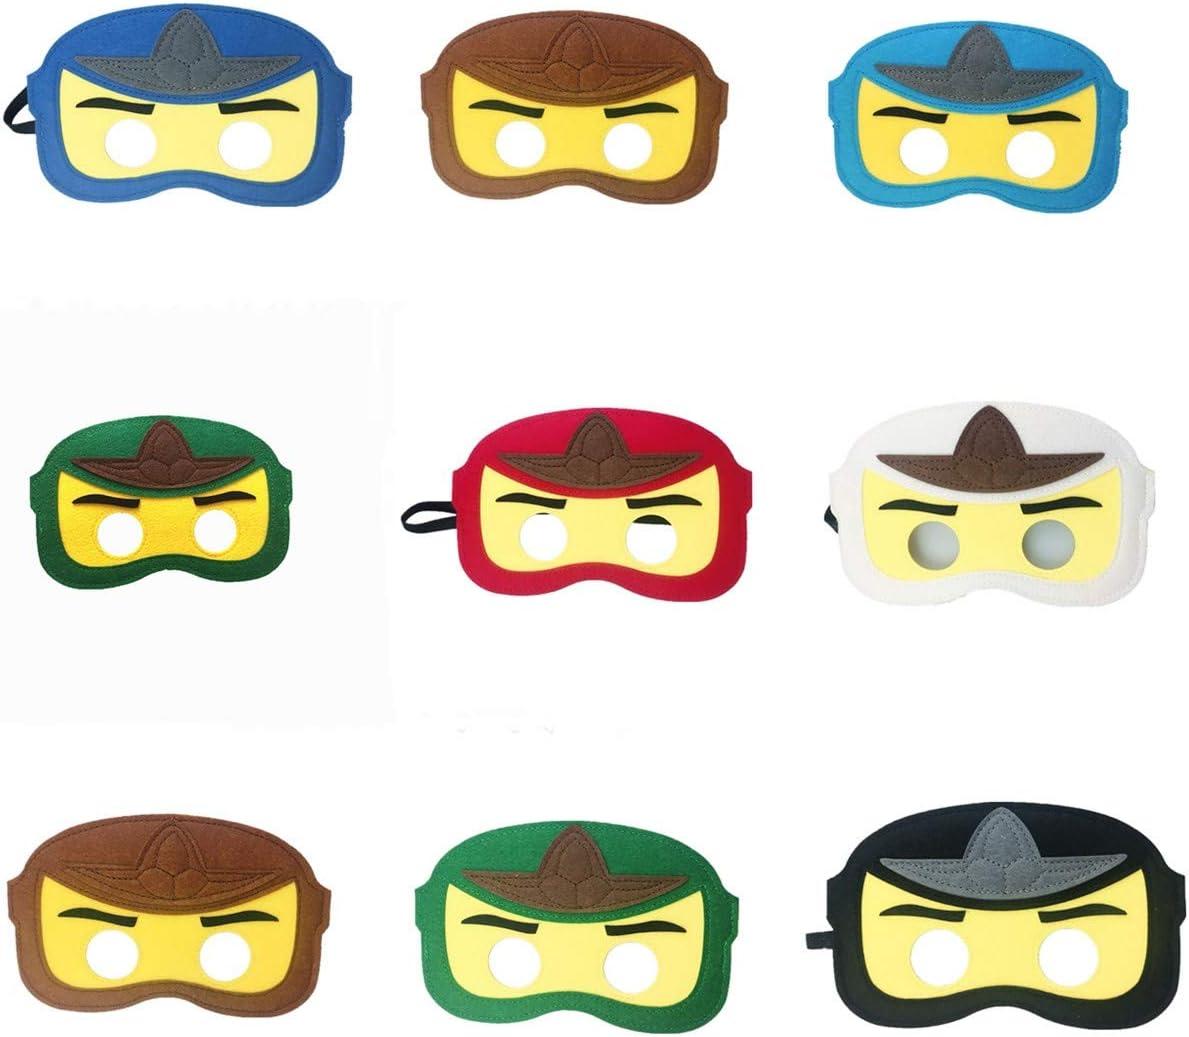 8Pc Ninja Ninjago Felt Mask Kids Birthday Gift Cosplay Party Supplies Party Masks für Children